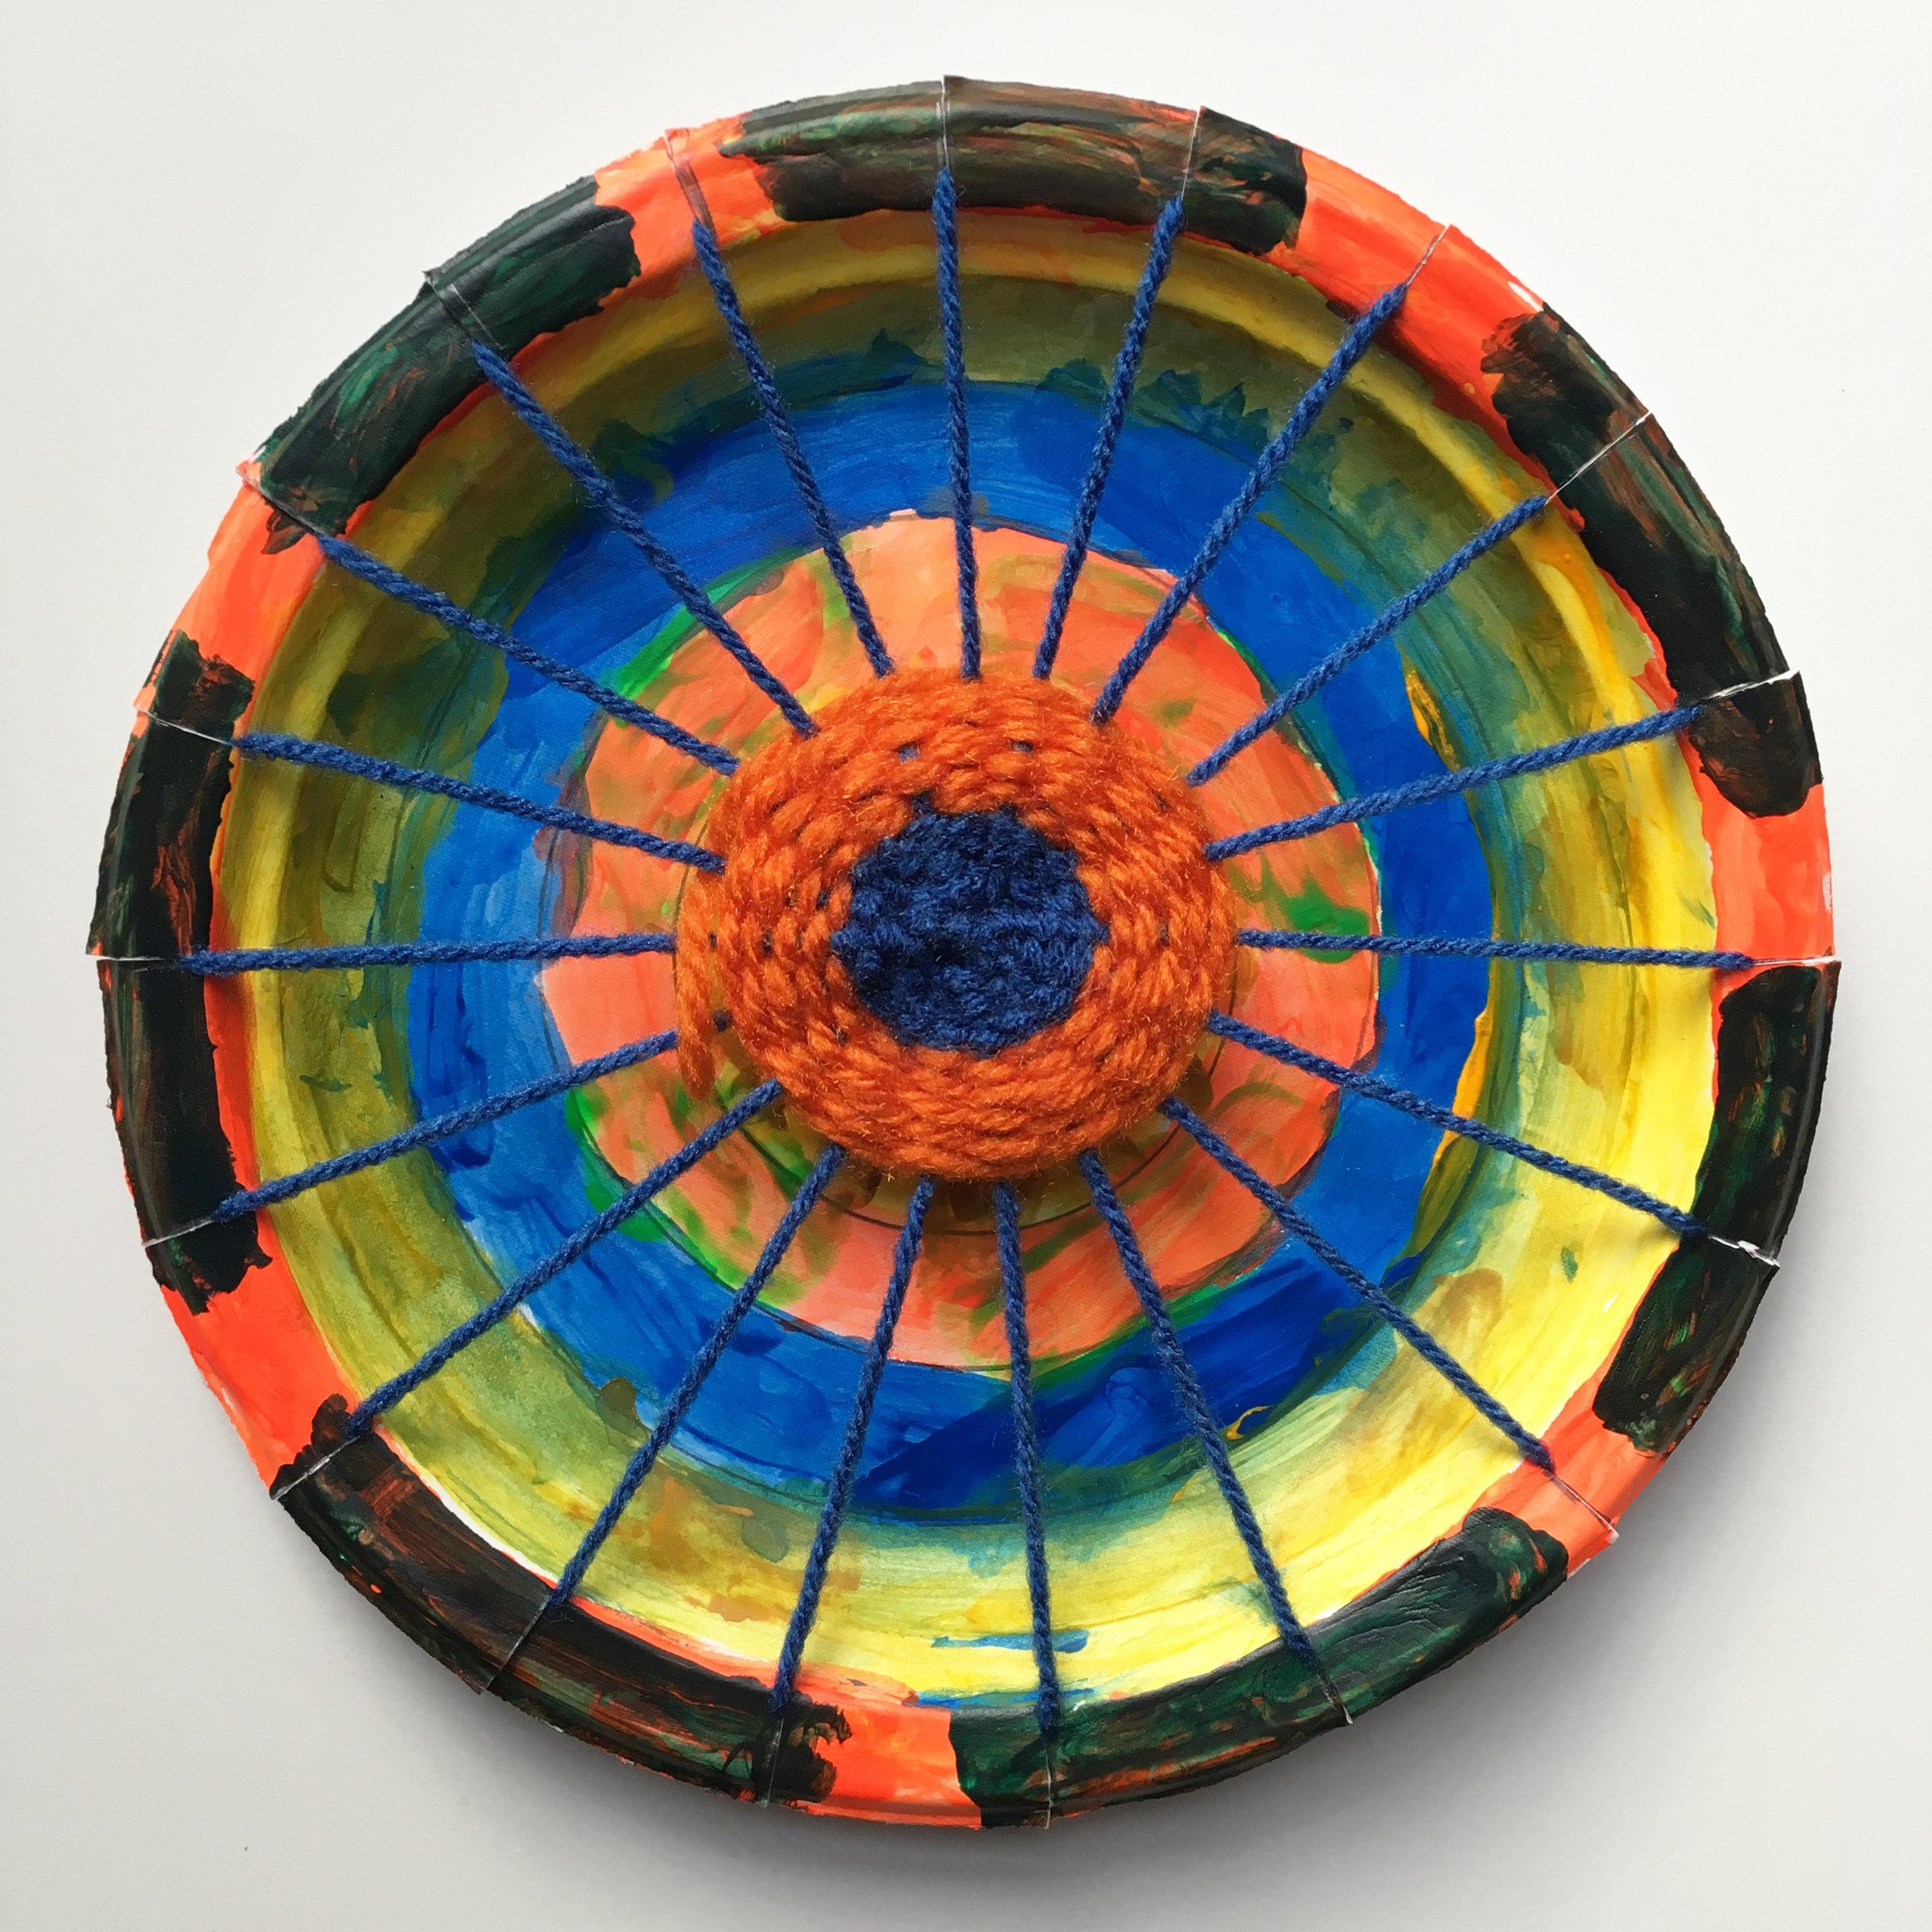 Cesar_circular weaving_01.jpg